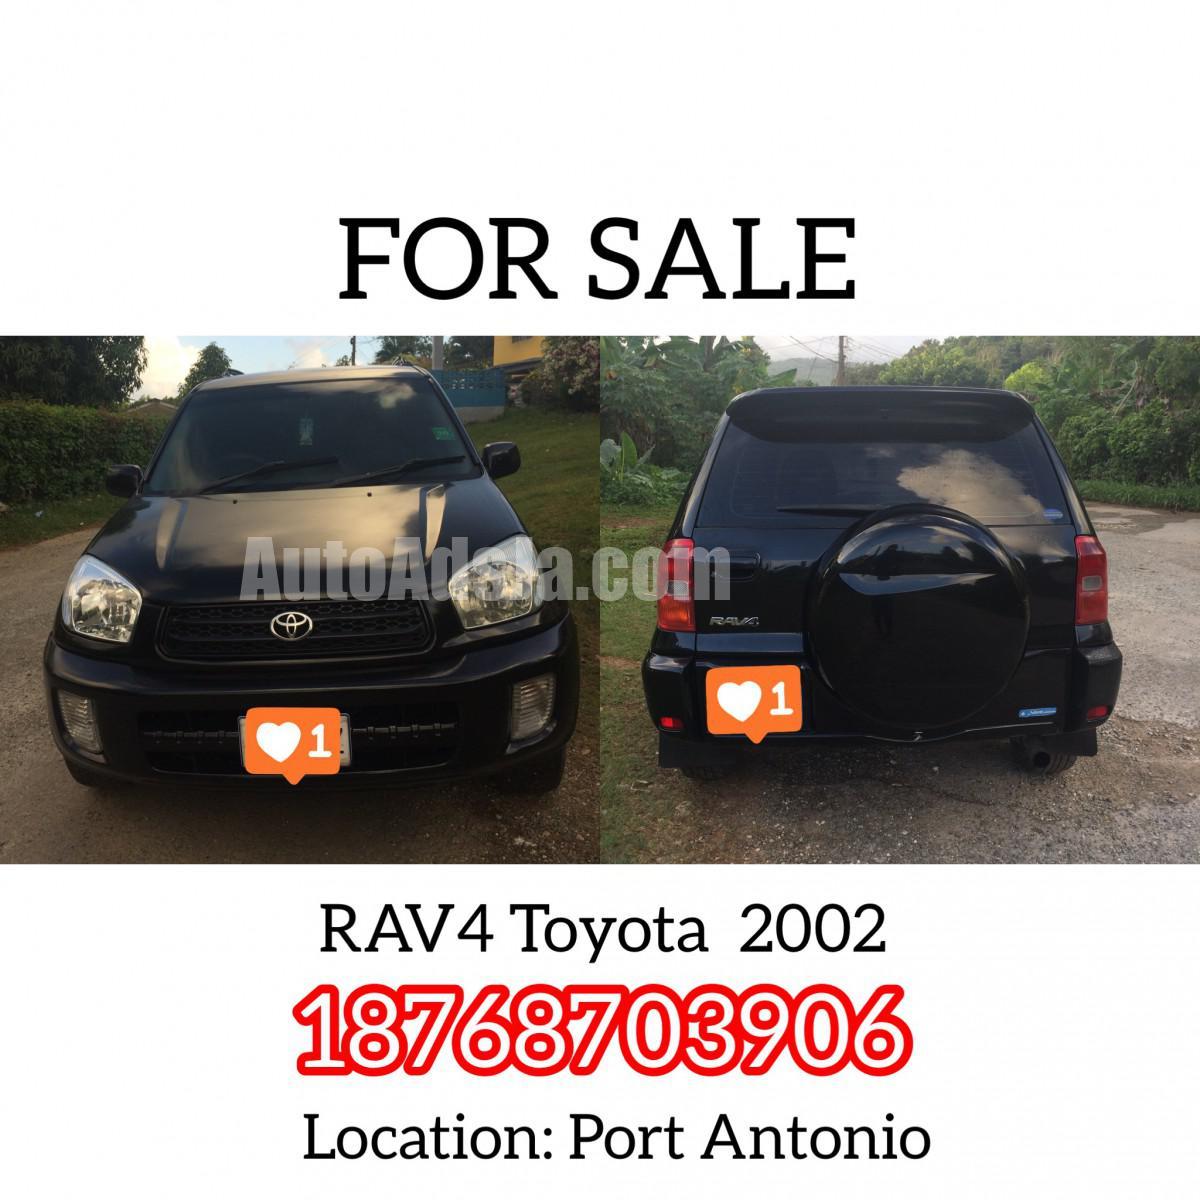 2002 Toyota Rav4 For Sale In Portland, Jamaica